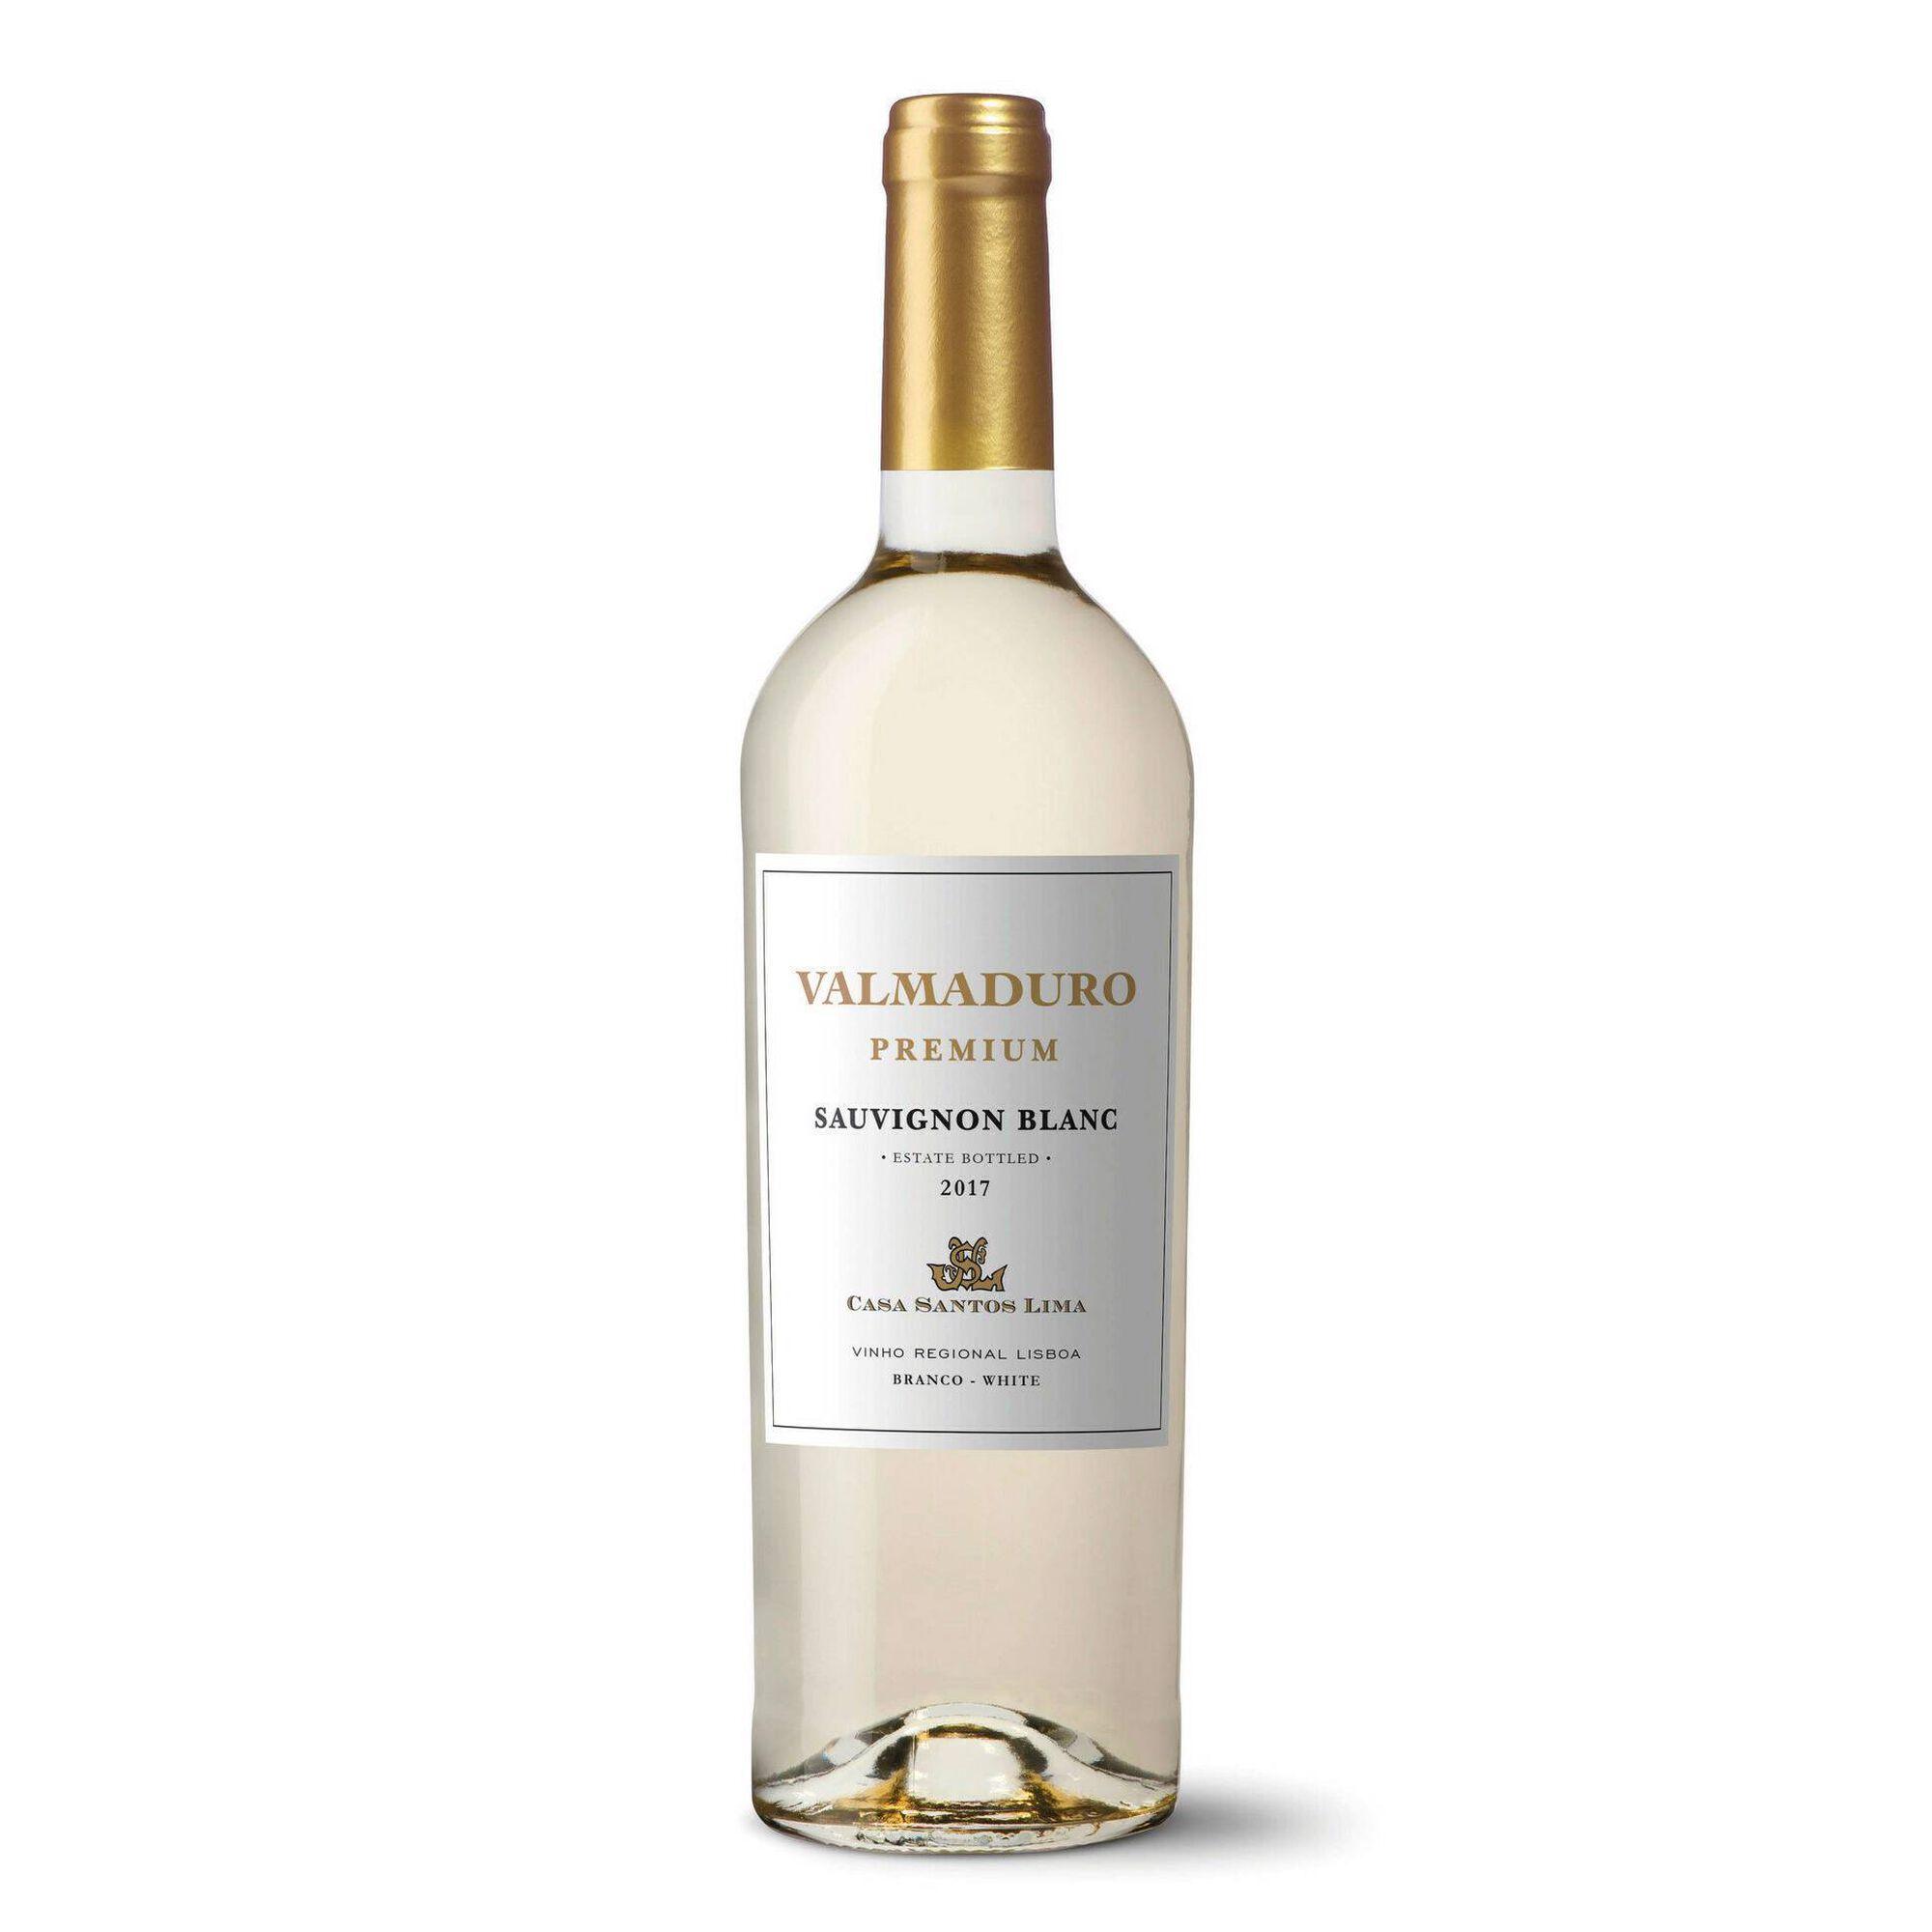 Valmaduro Sauvignon Blanc Premium Regional Lisboa Vinho Branco